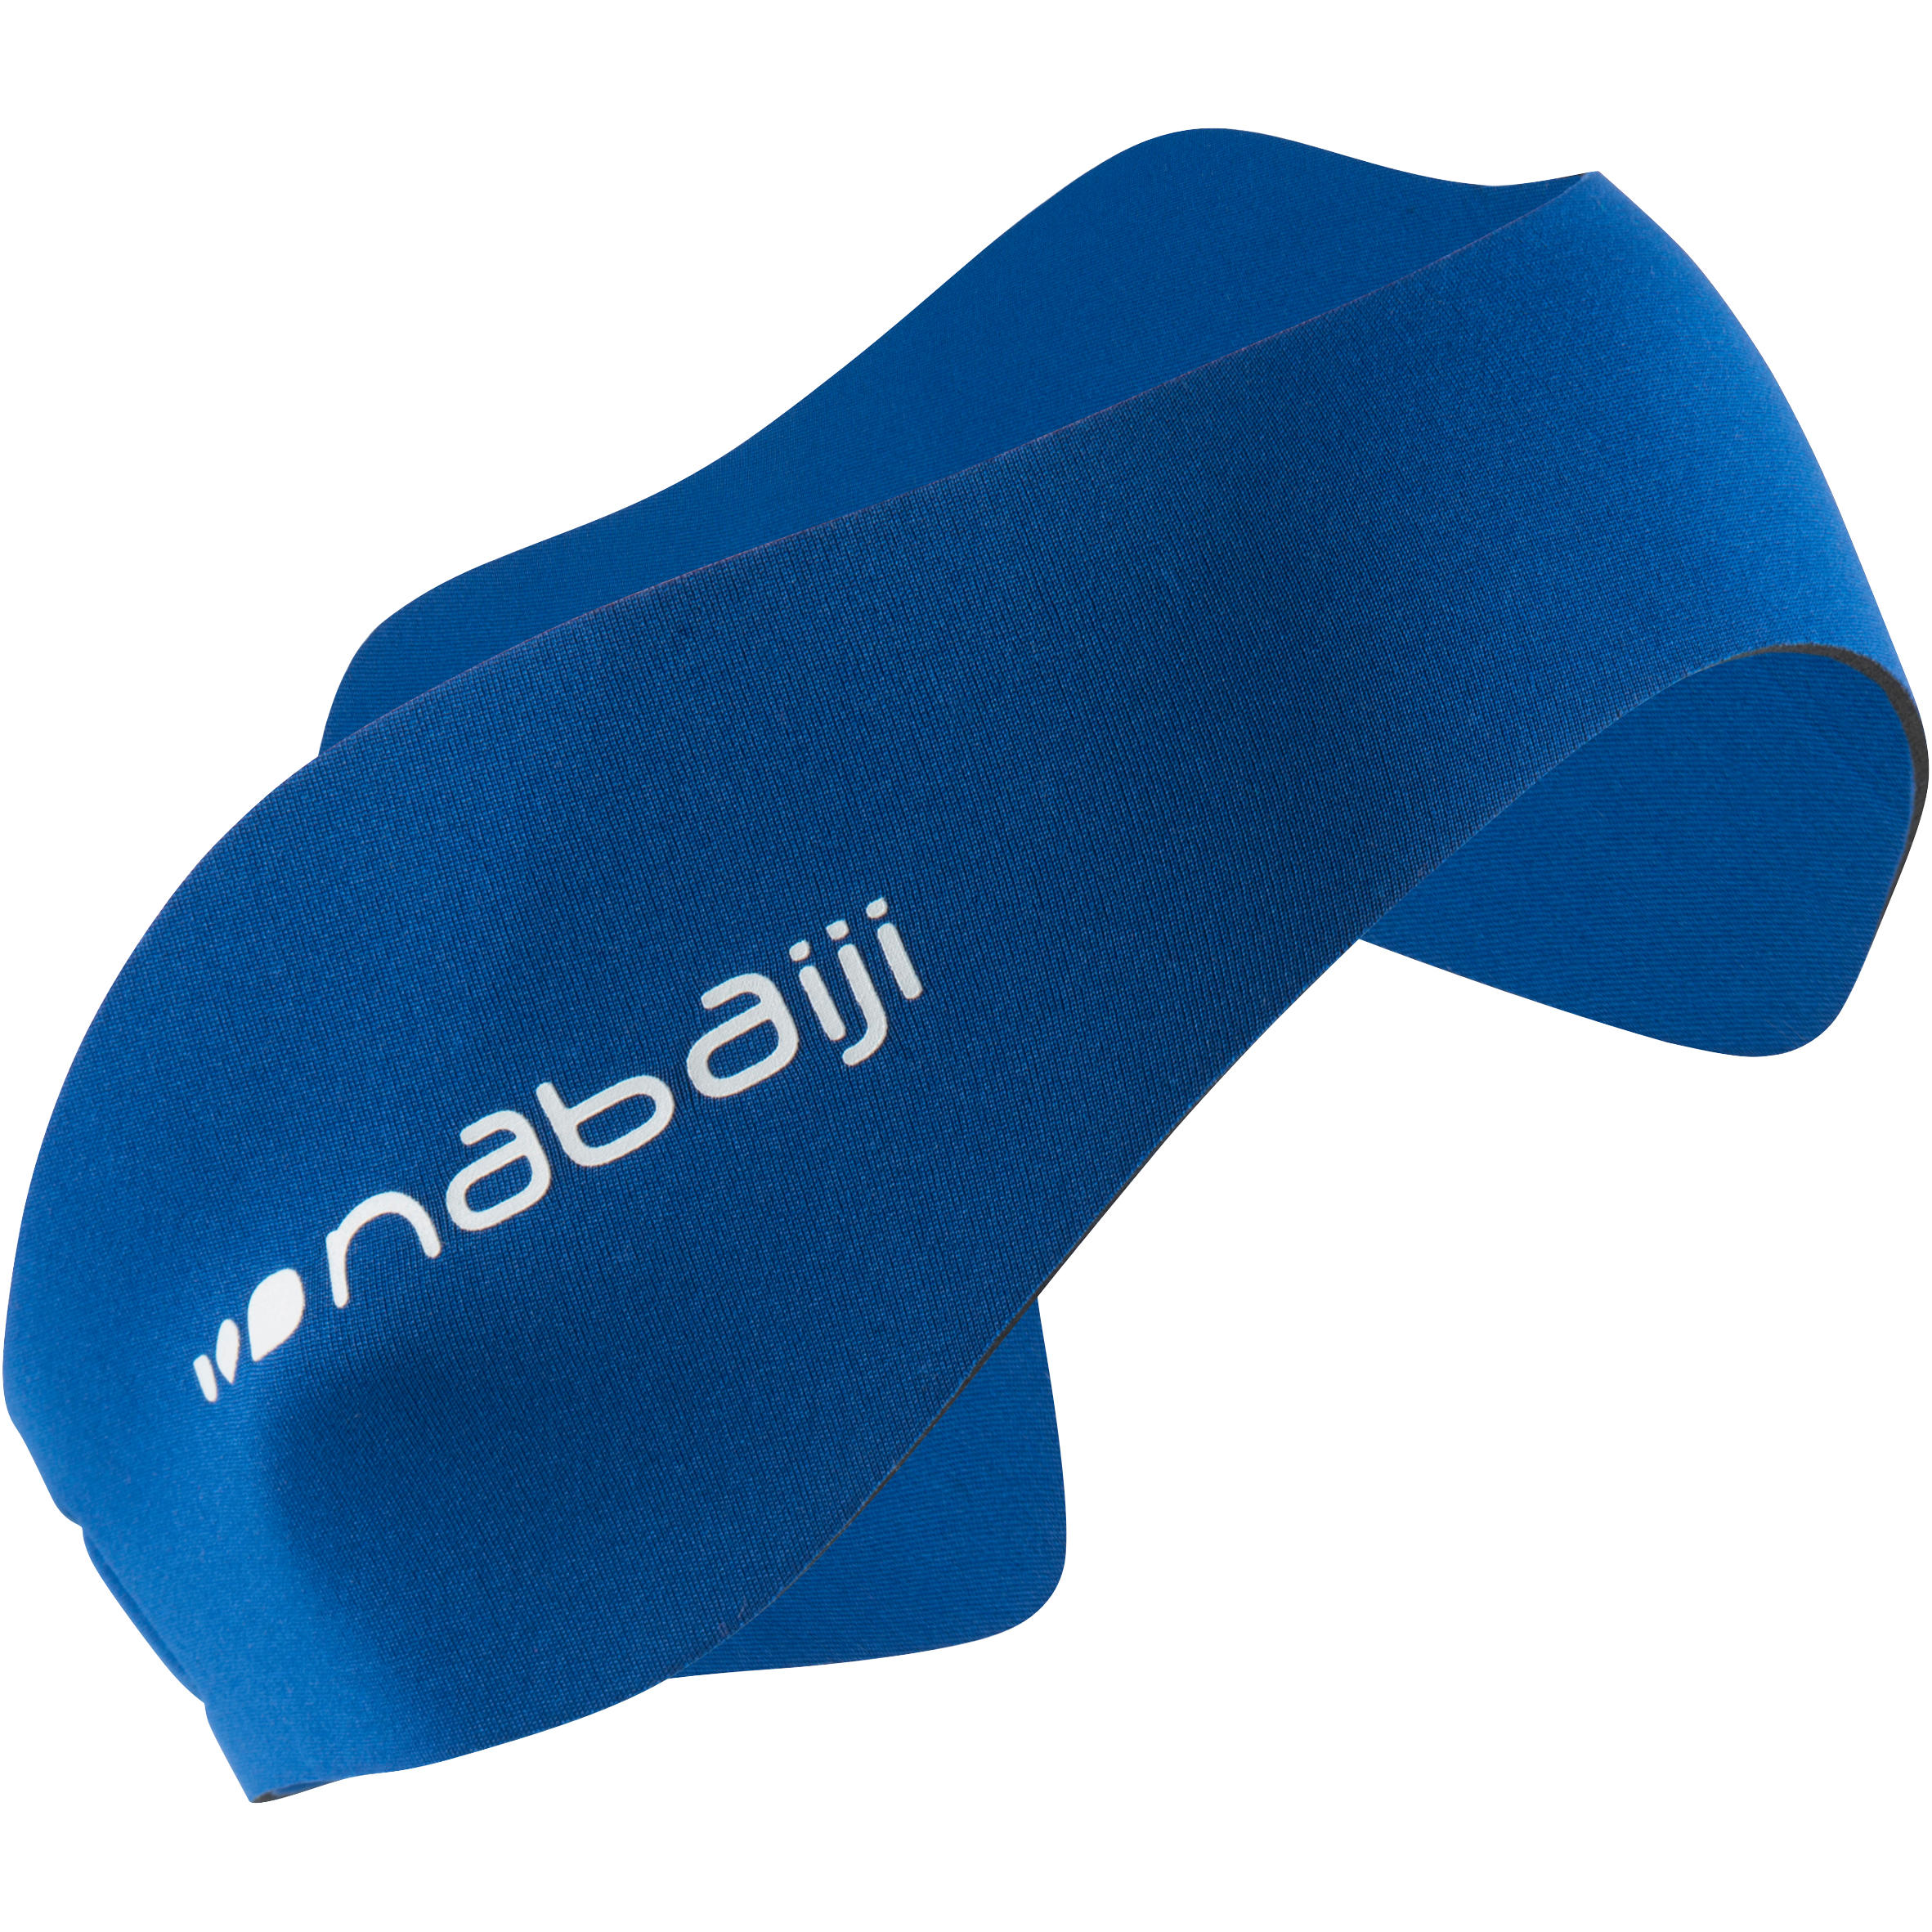 NEOPRENE EAR PROTECTION SWIMMING BAND - BLUE